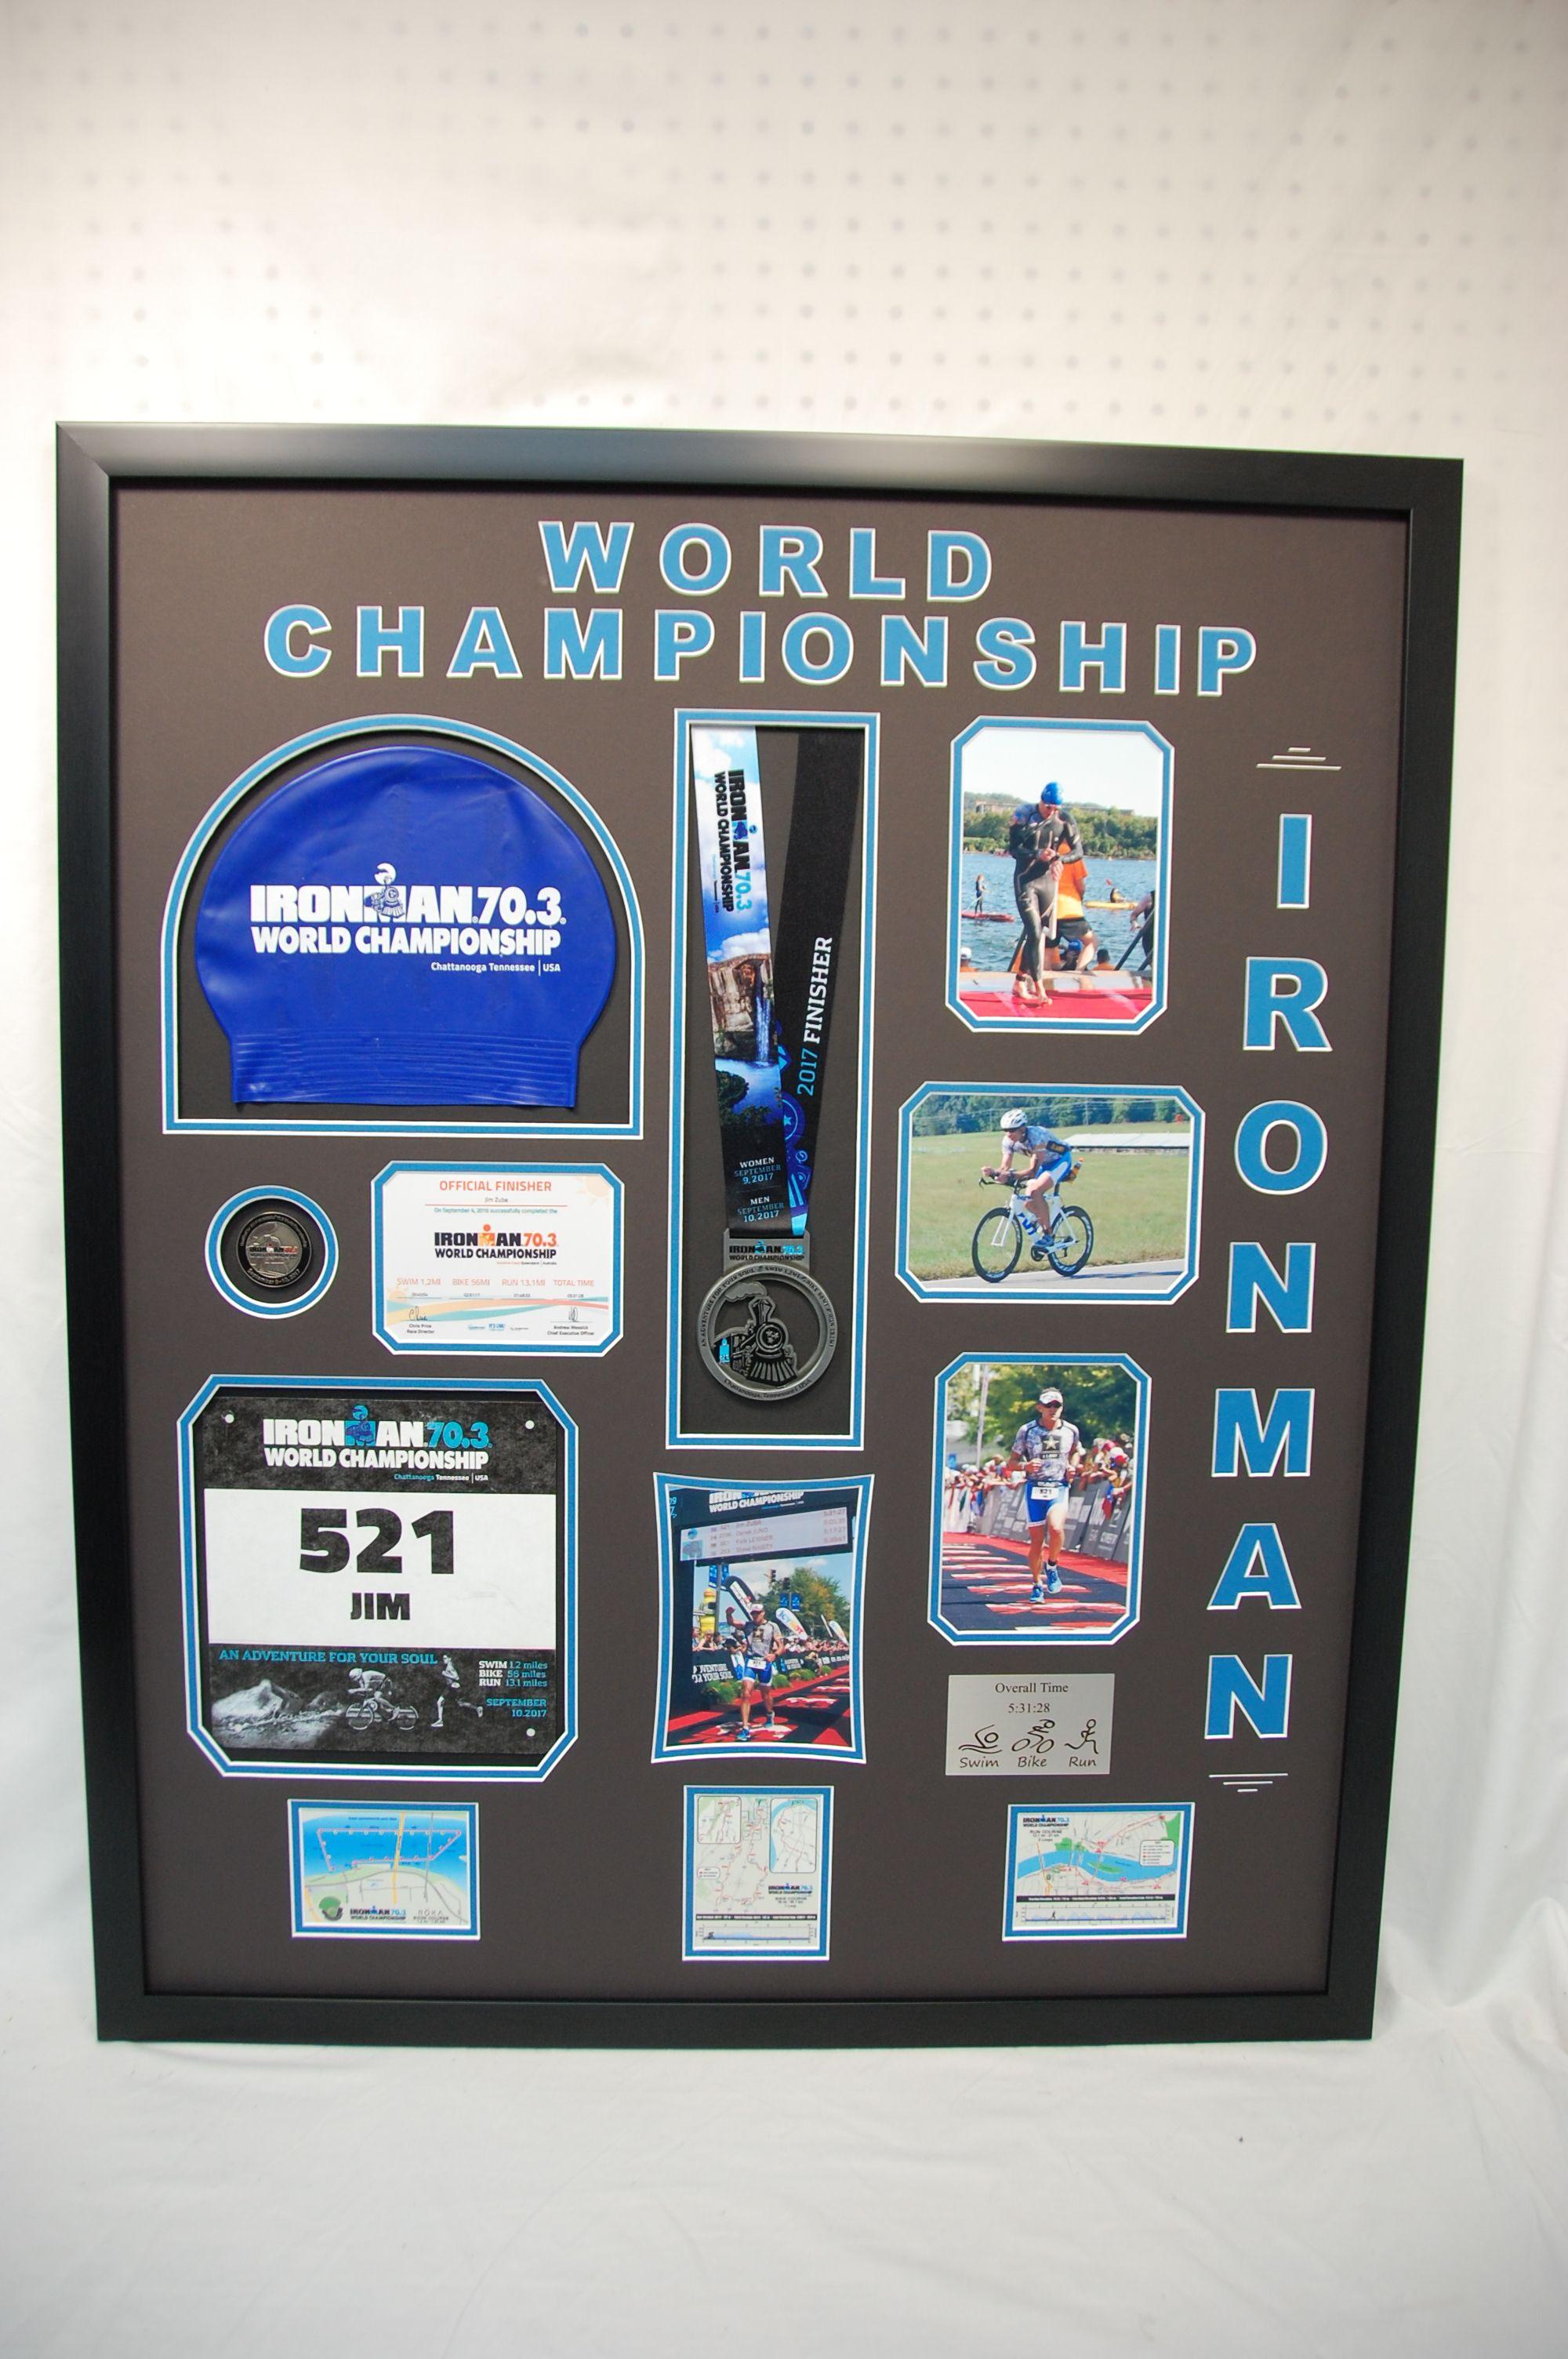 24 X 30 Ironman World Championship Sports Frame Display We Mounted The Swim Cap Race Bib Medal And Num Frame Display Swim Cap Display Sports Shadow Boxes